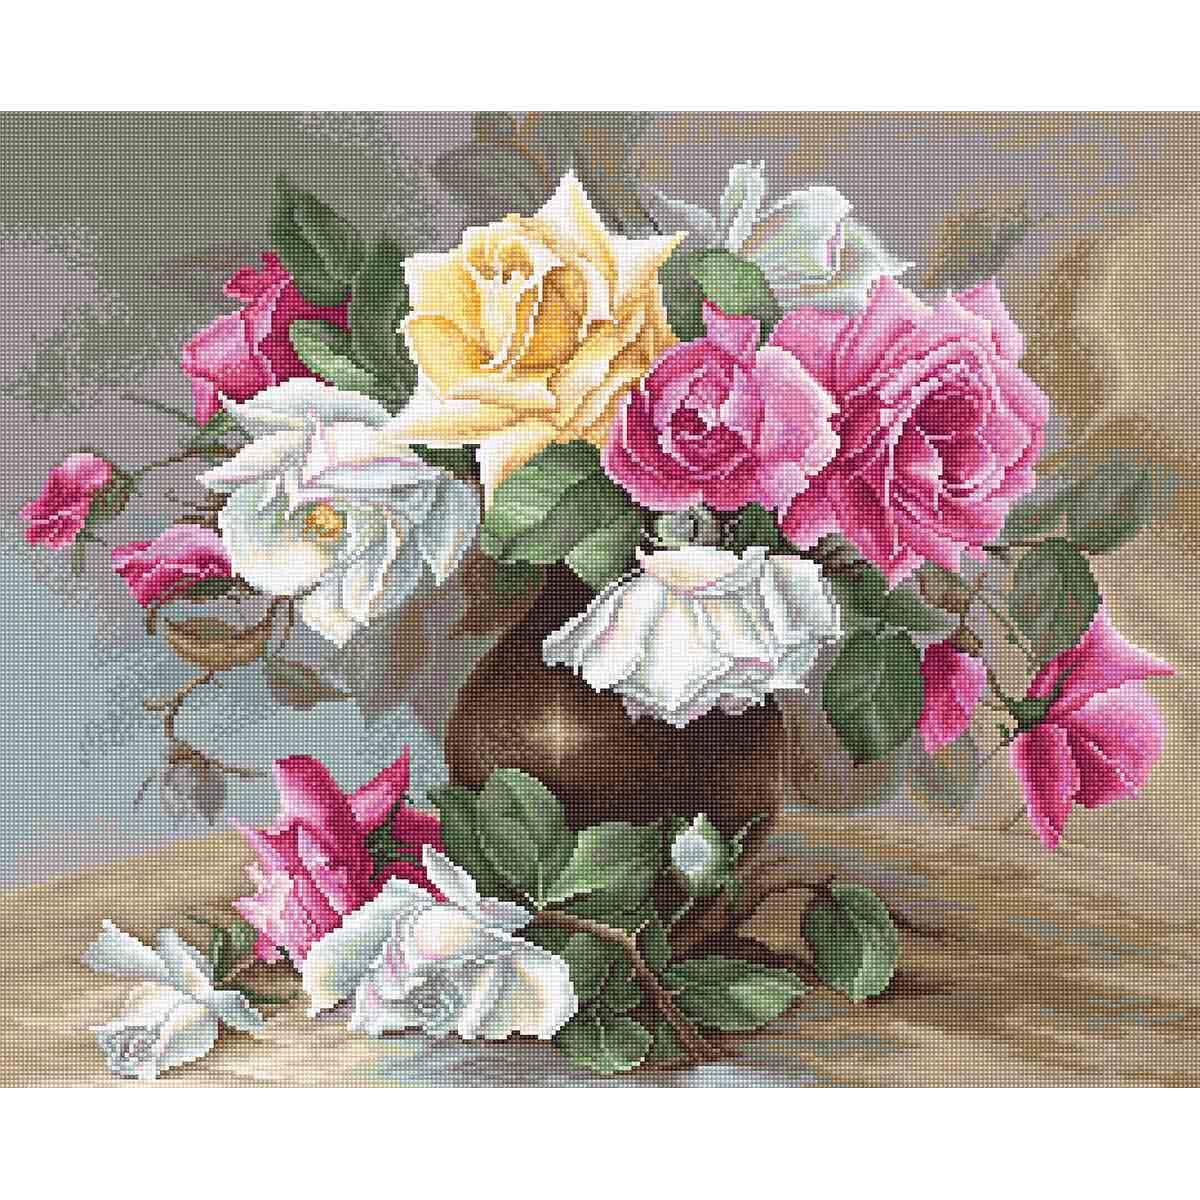 B587 Набор для вышивания Luca-S 'Ваза с розами' 38*31см фото